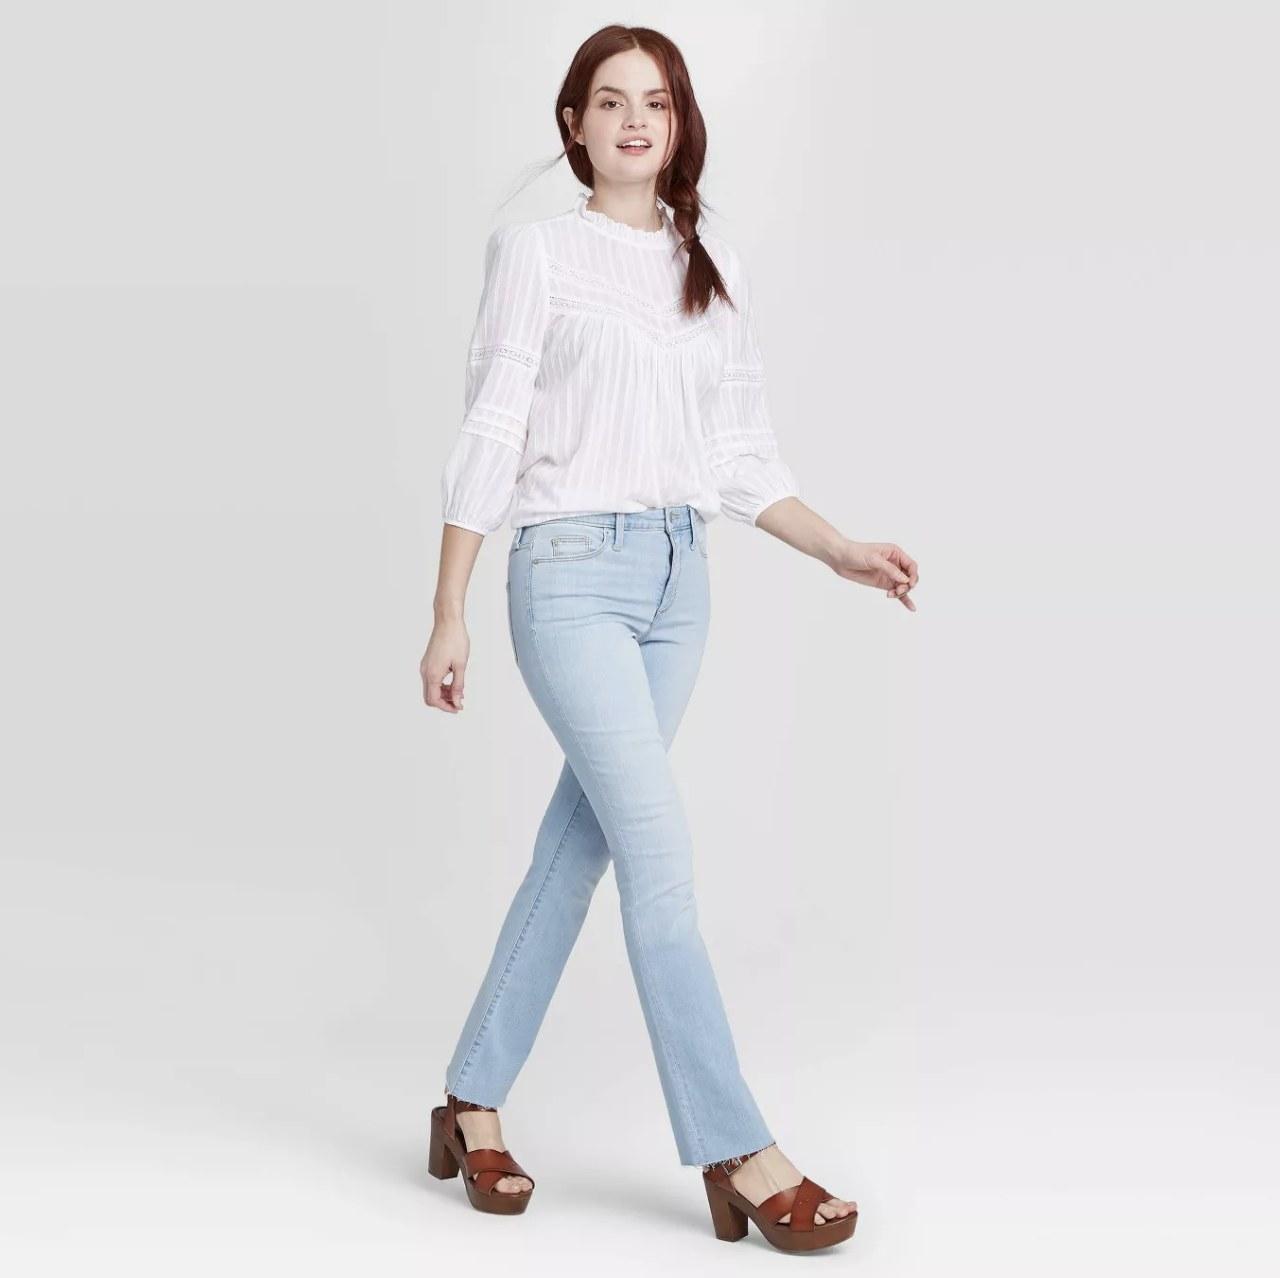 Model wearing the jeans